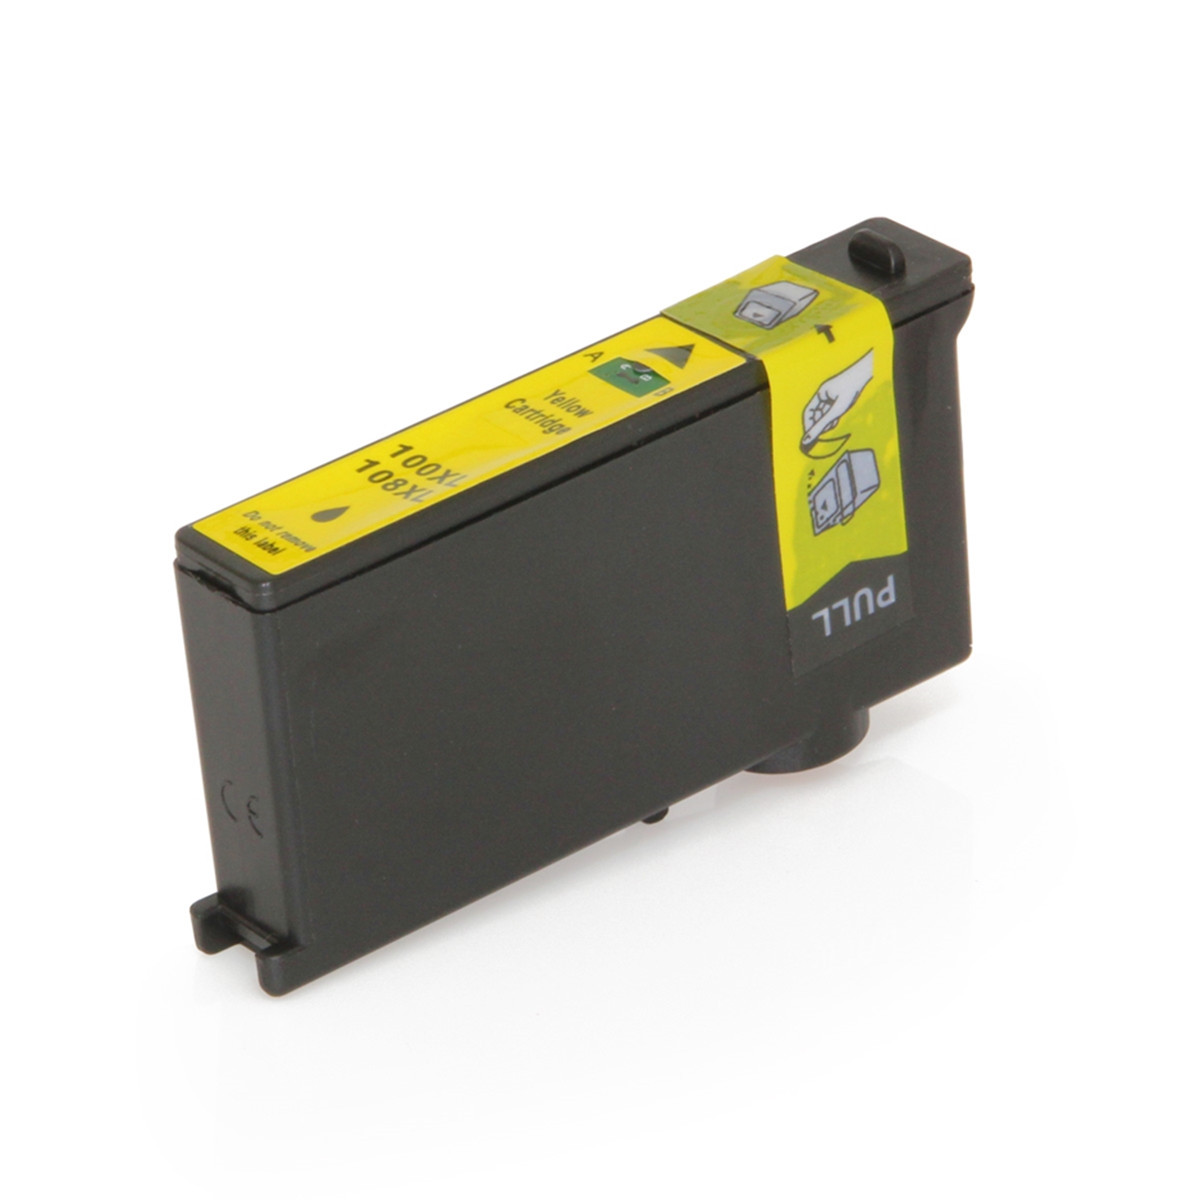 Cartucho de Tinta Compatível com Lexmark 100XL Amarelo 14N1071 Pro-905 Pro-805 Pro-705 205 | 11,5ml